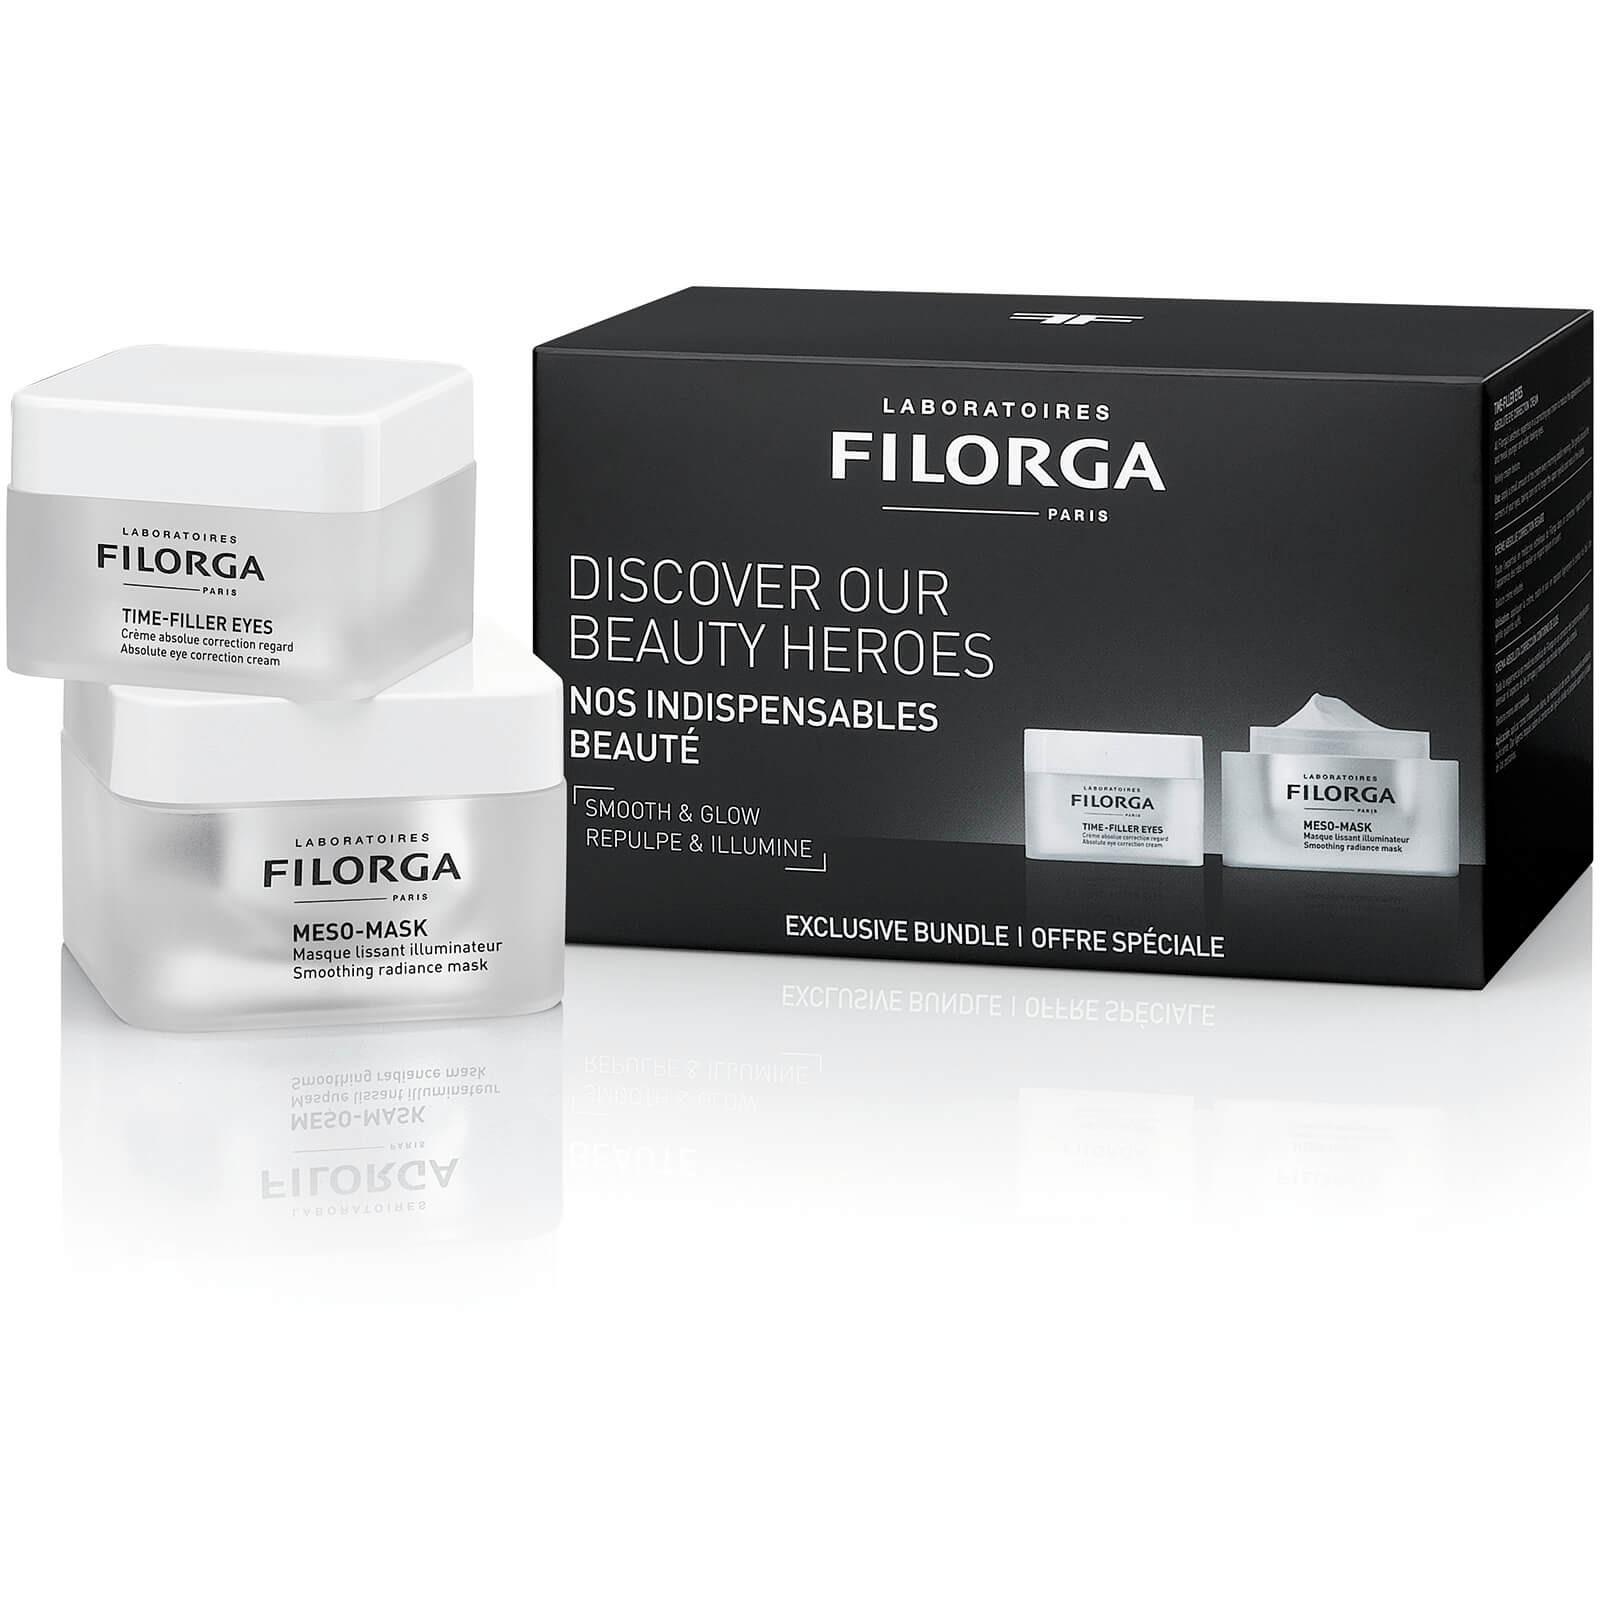 Filorga 菲洛嘉十全大补面膜+逆龄眼霜套装 (价值:$118)